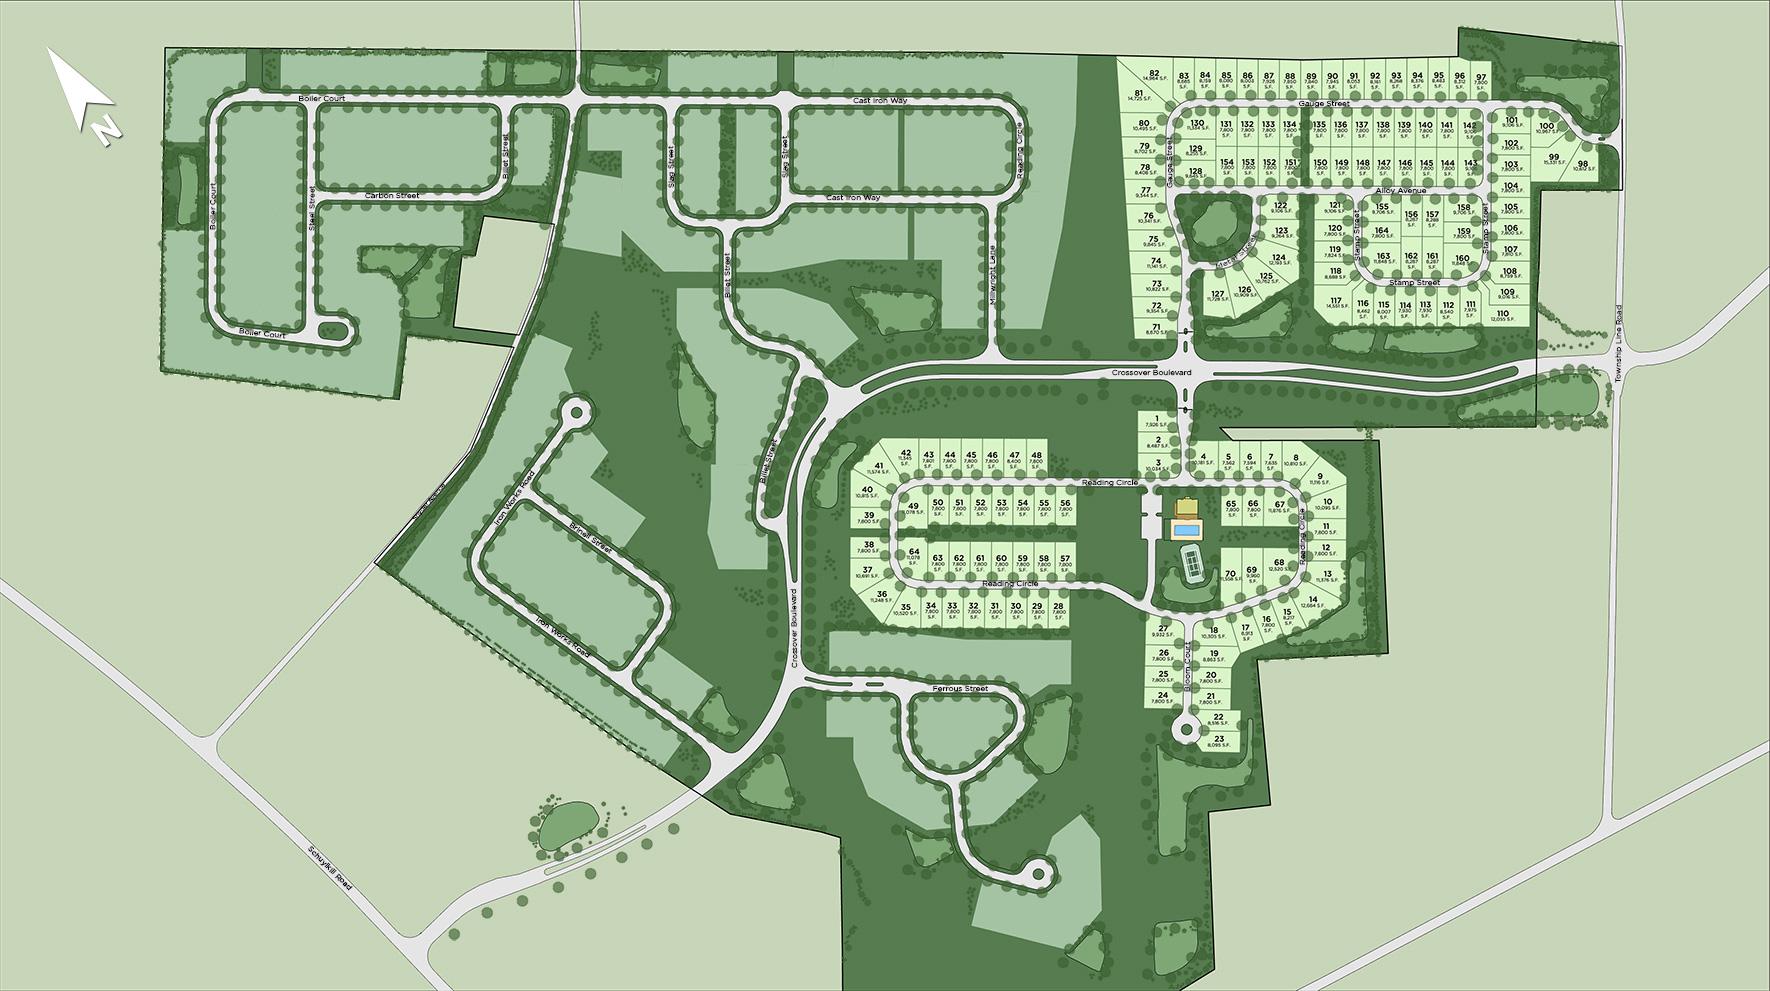 Regency at Kimberton Glen Overall Site Plan